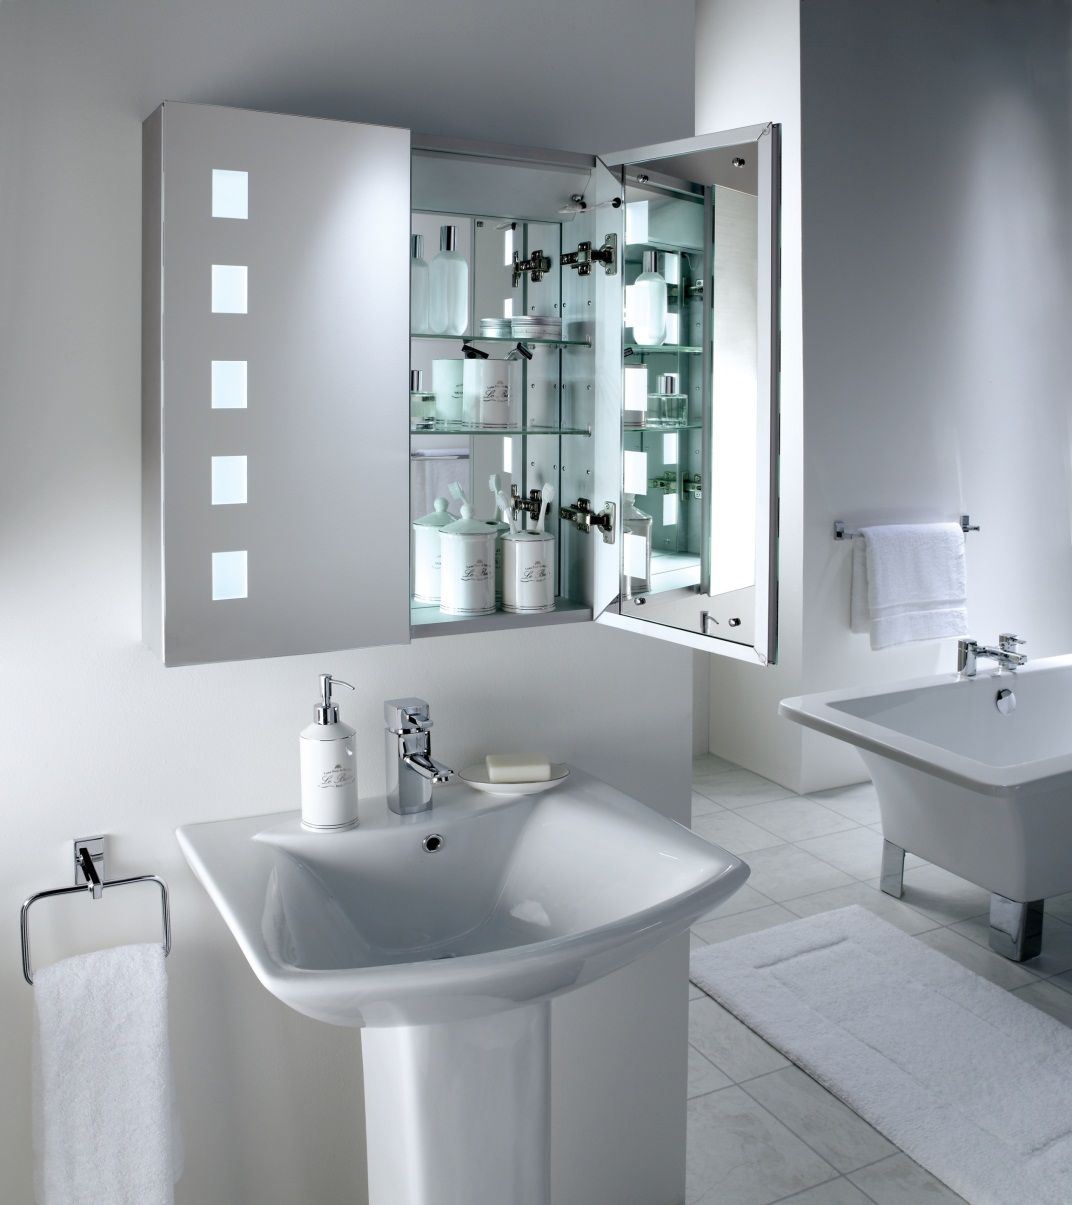 21 Bathroom Mirror Ideas to Inspire Your Home Refresh ...